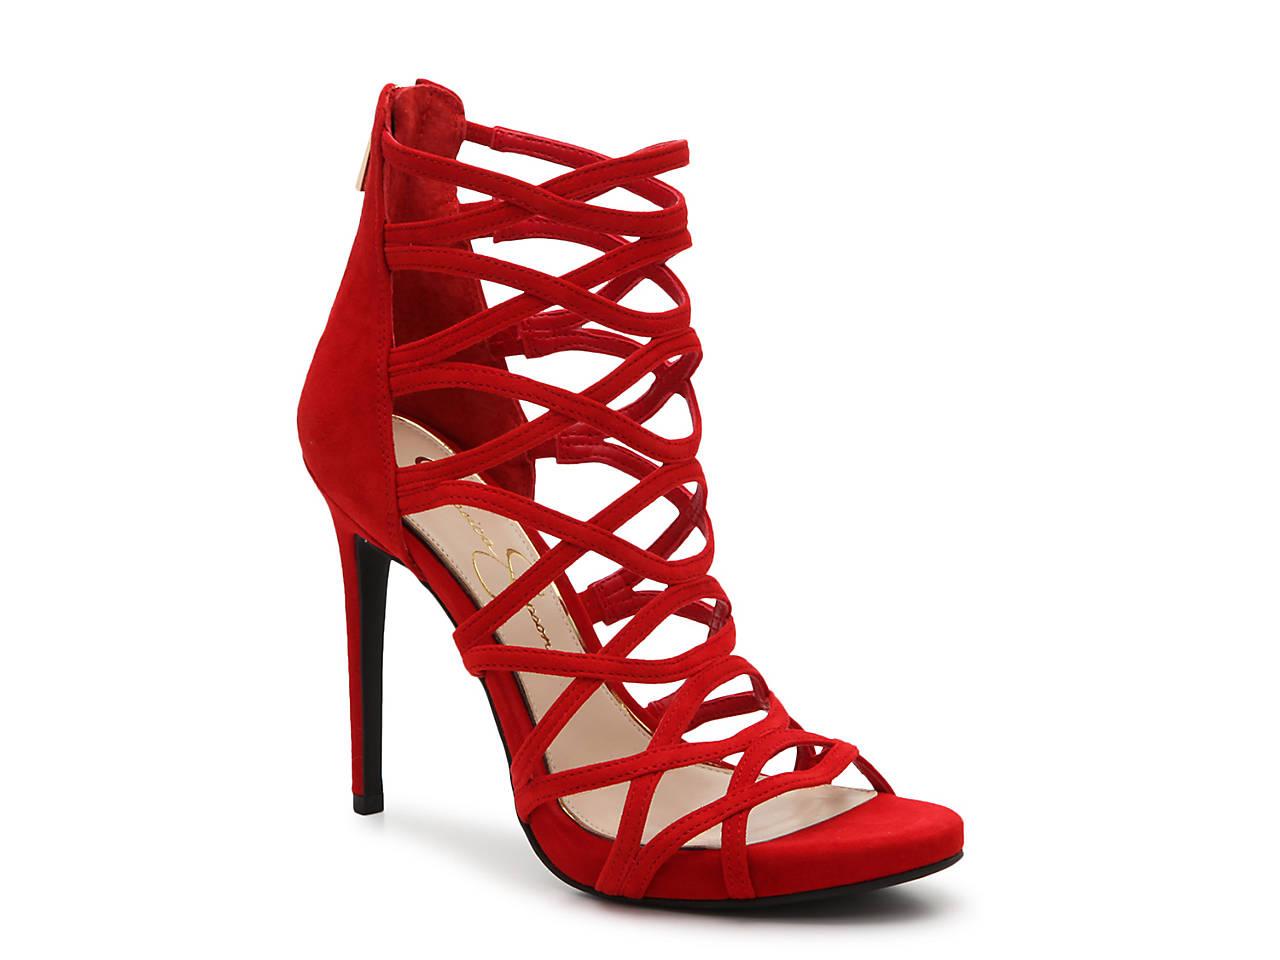 9923b462c9f5 Jessica Simpson Razella Platform Sandal Women s Shoes